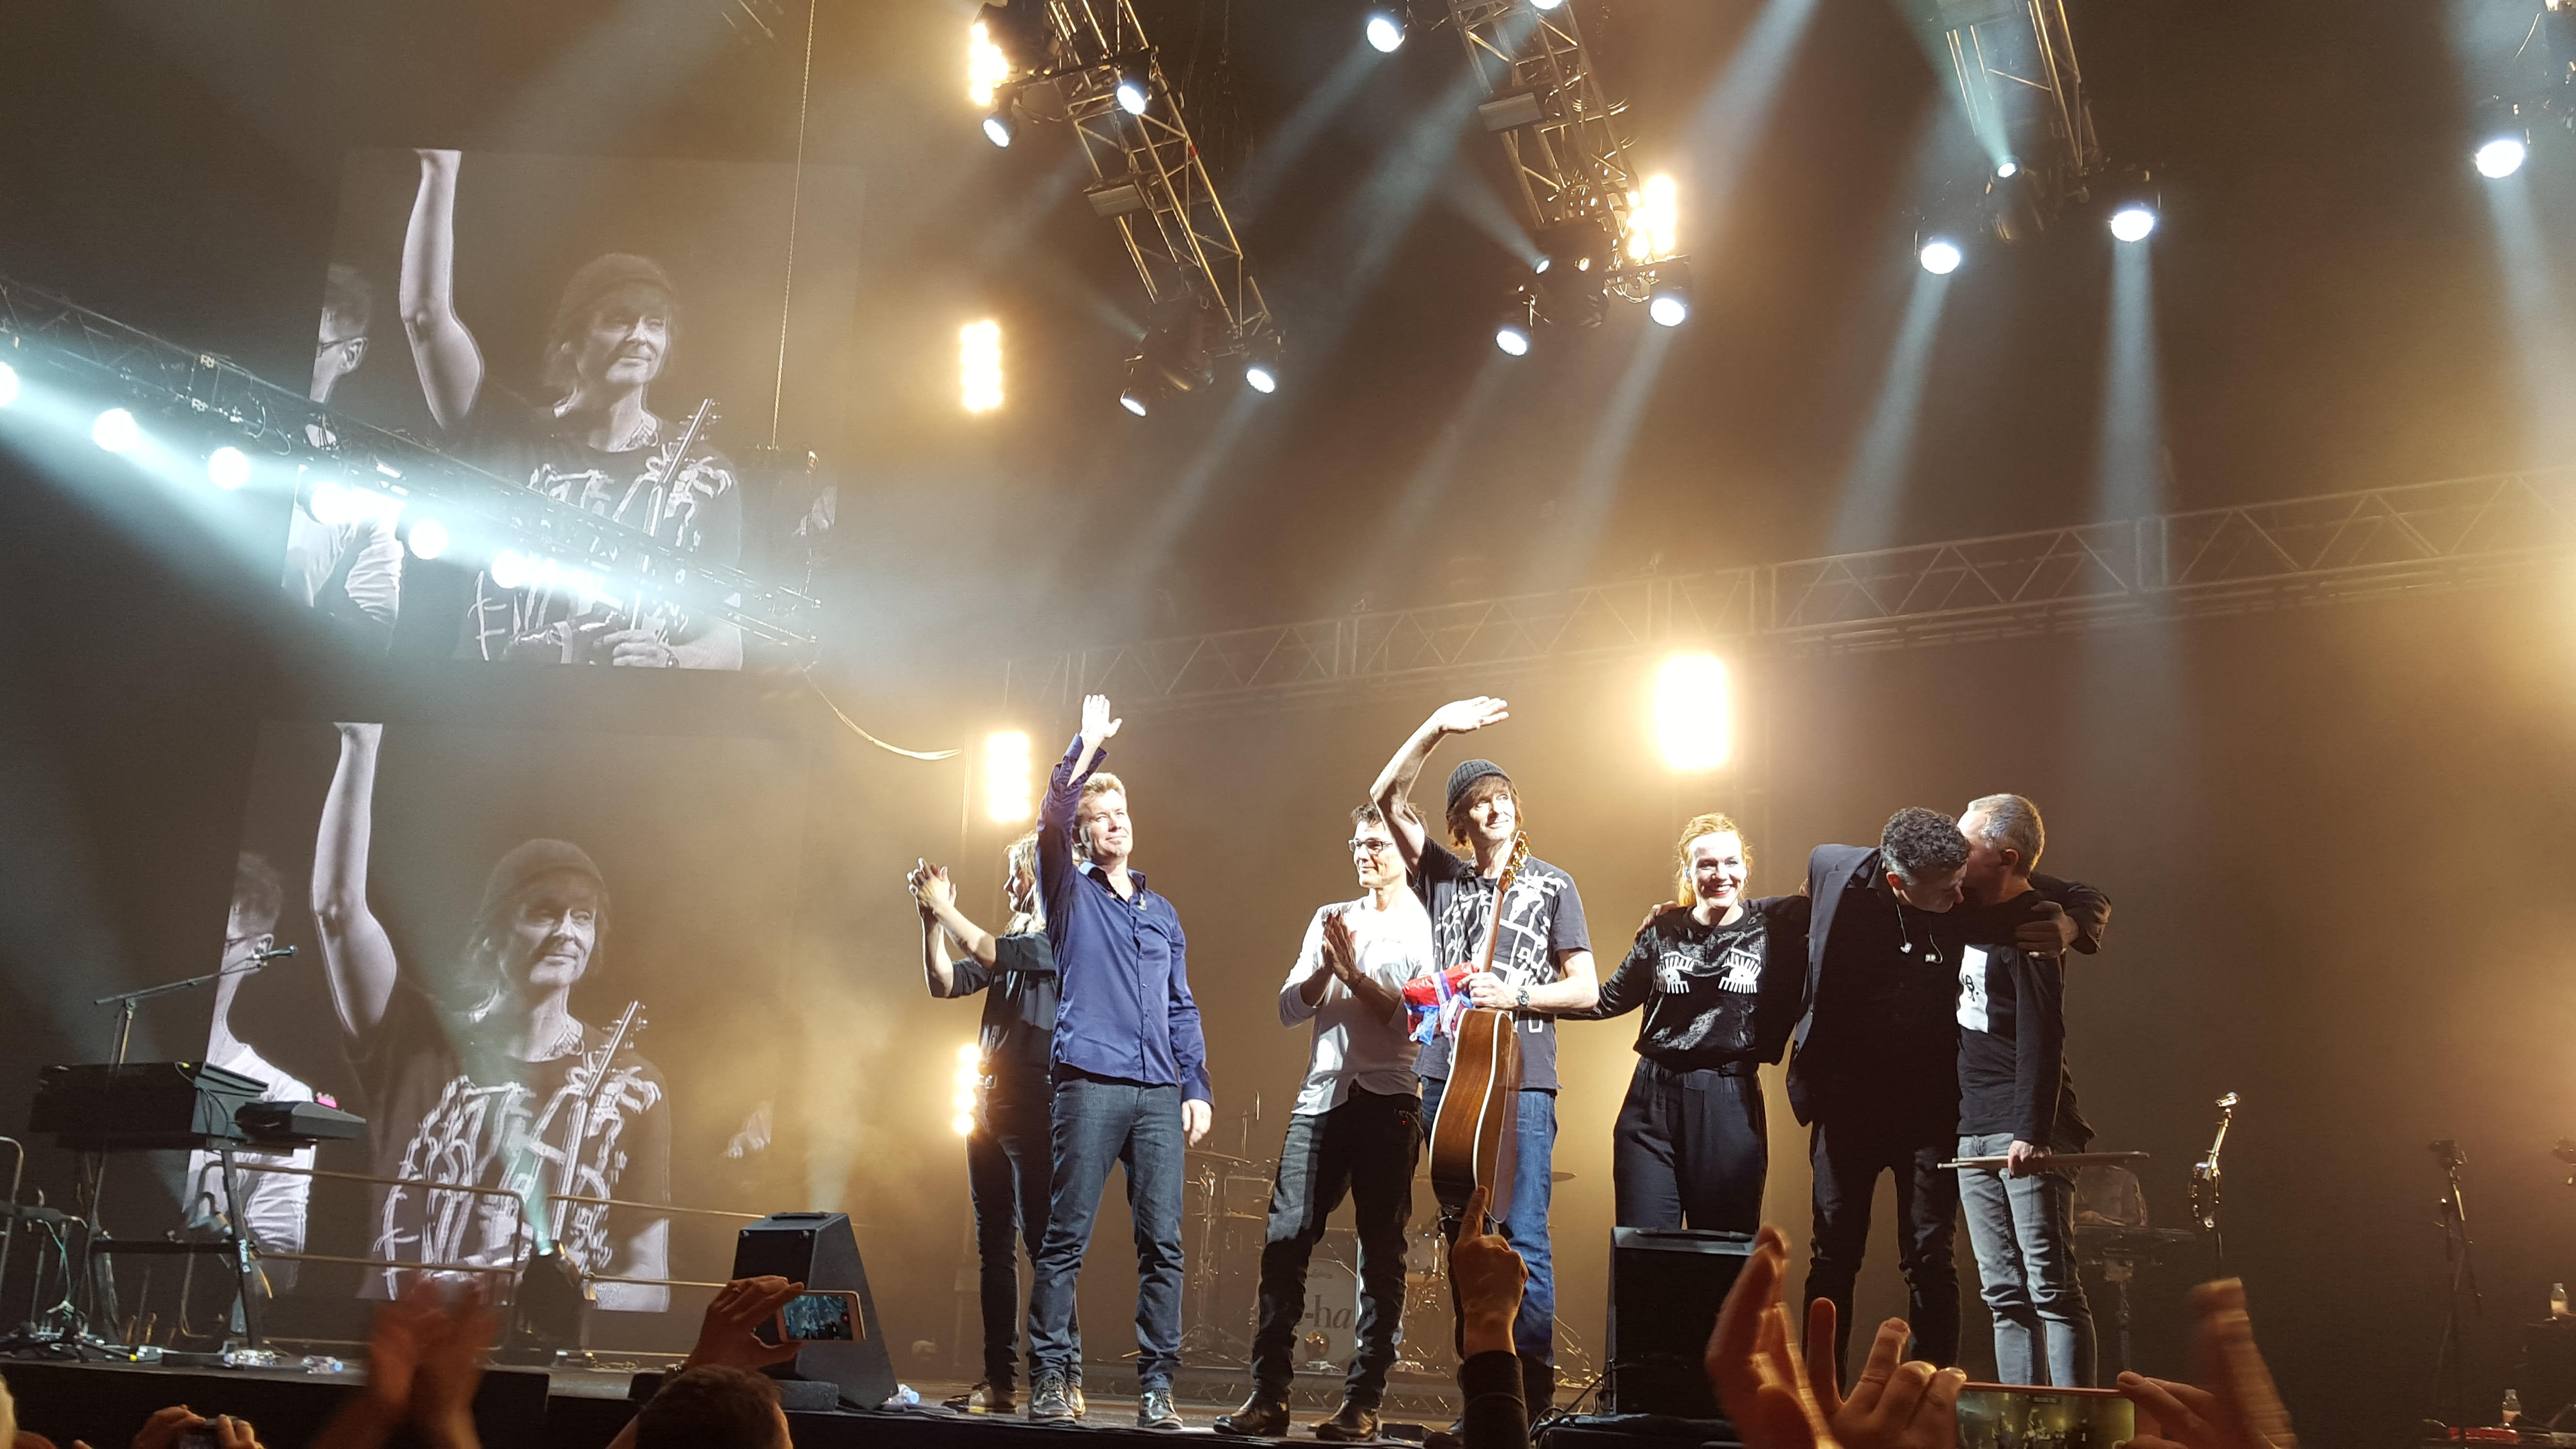 a-ha bidding farewell at Oslo Spektrum